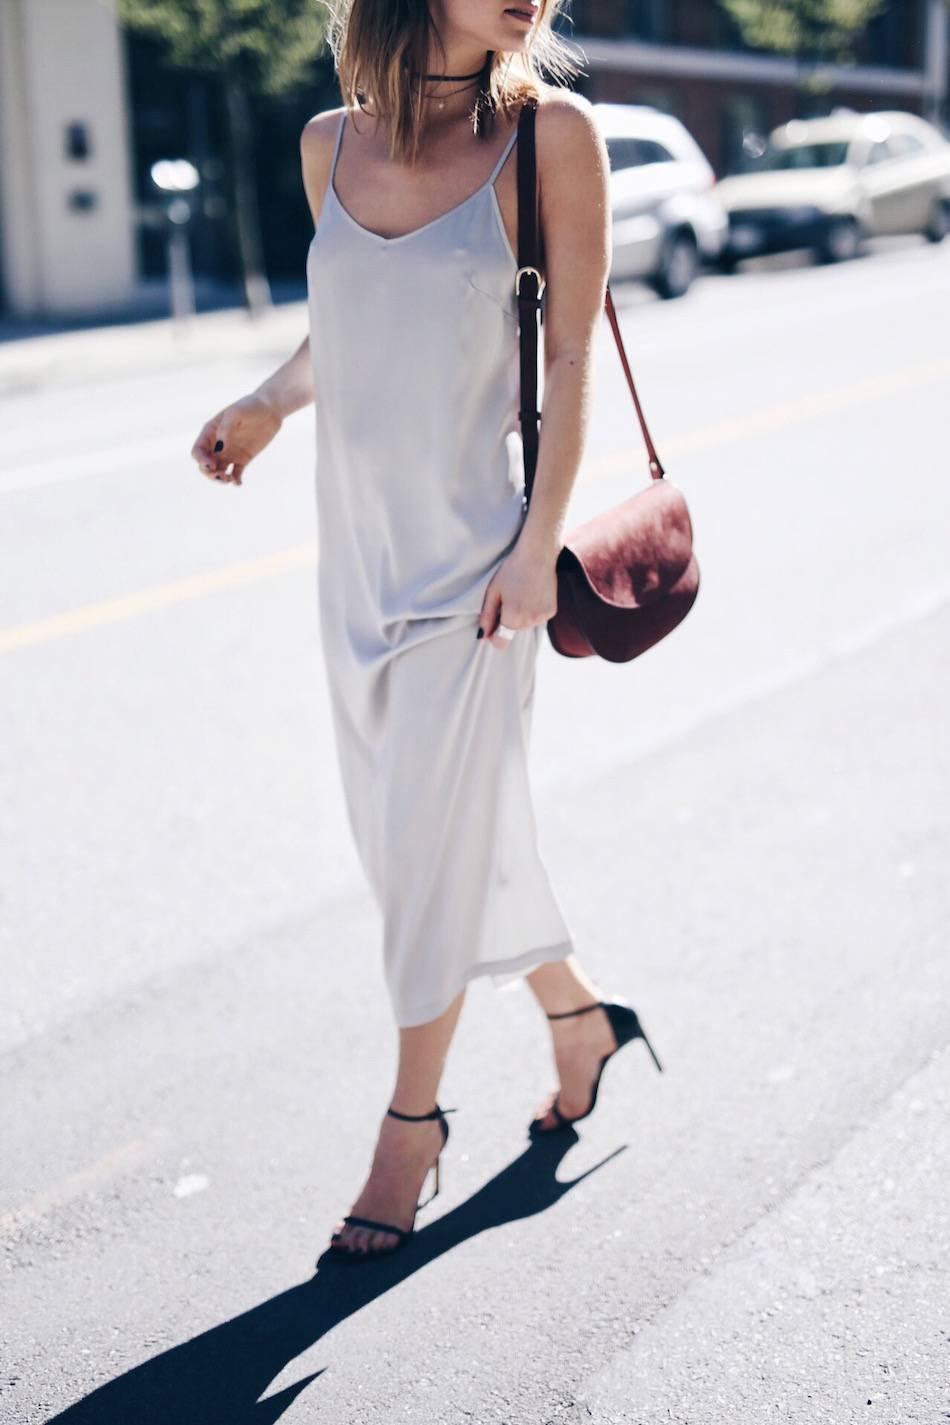 90's slip dress